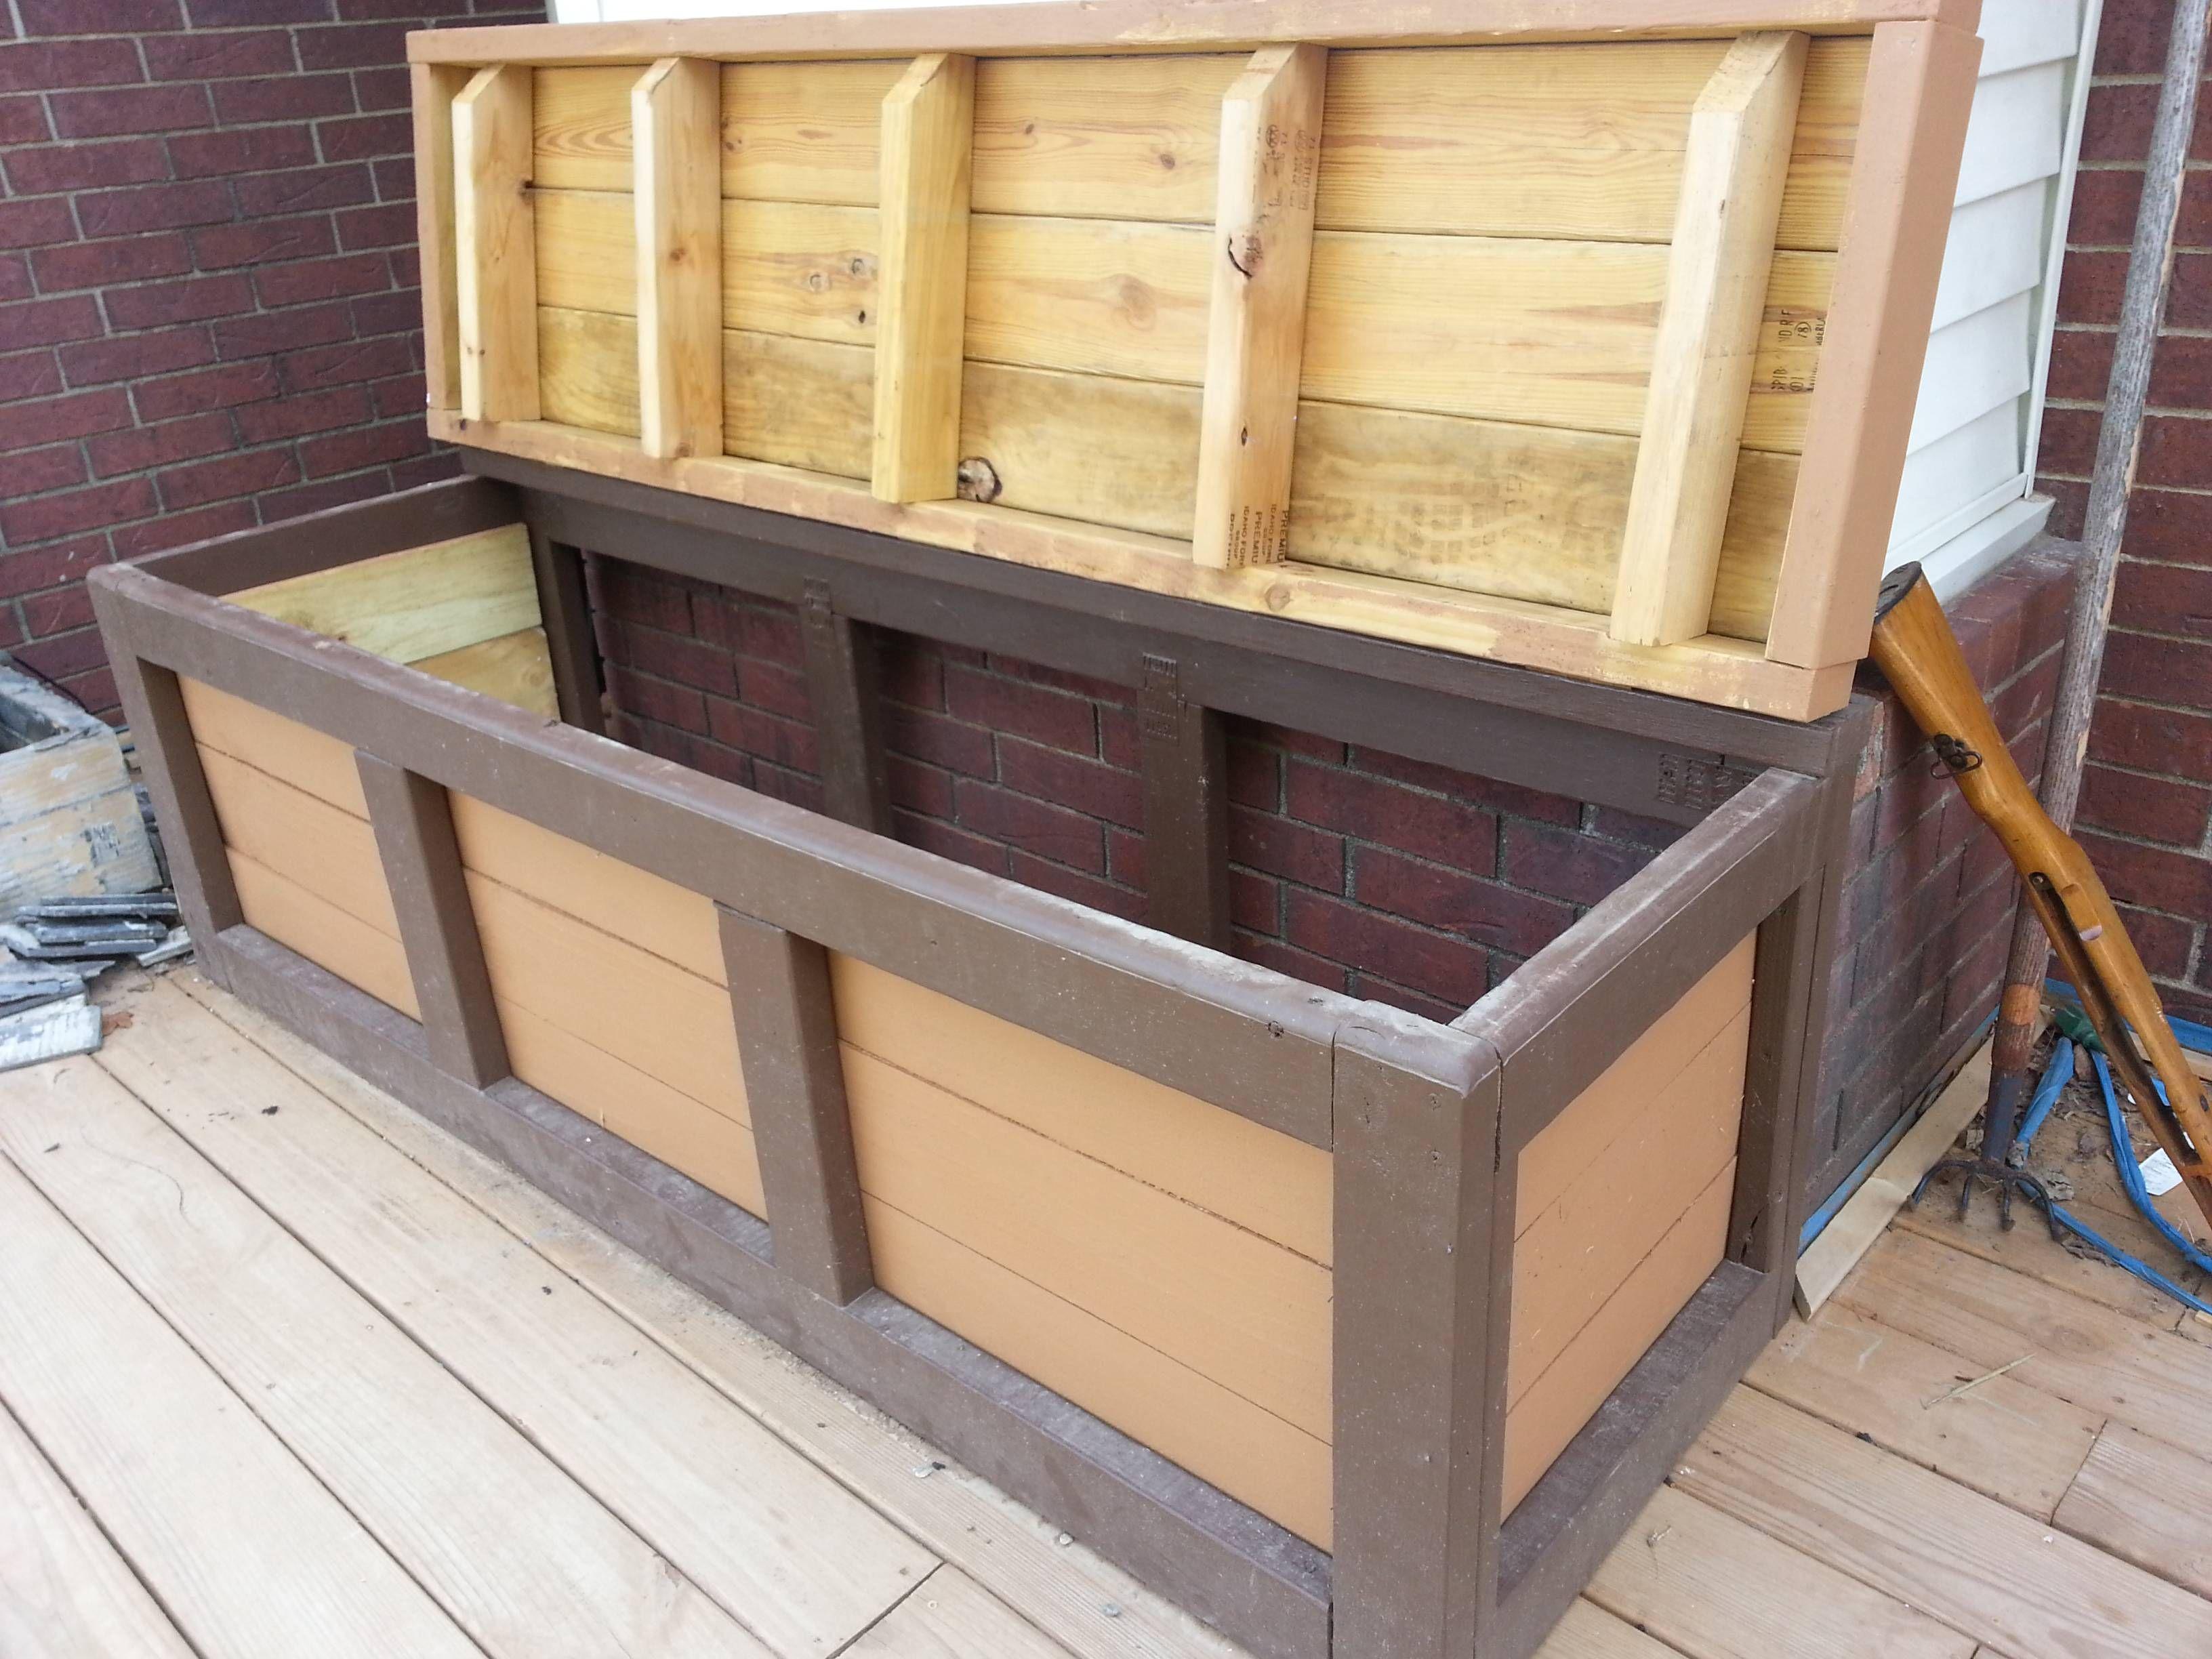 Awe Inspiring Finished Storage Bench And Hopefully This Post Worked Uwap Interior Chair Design Uwaporg